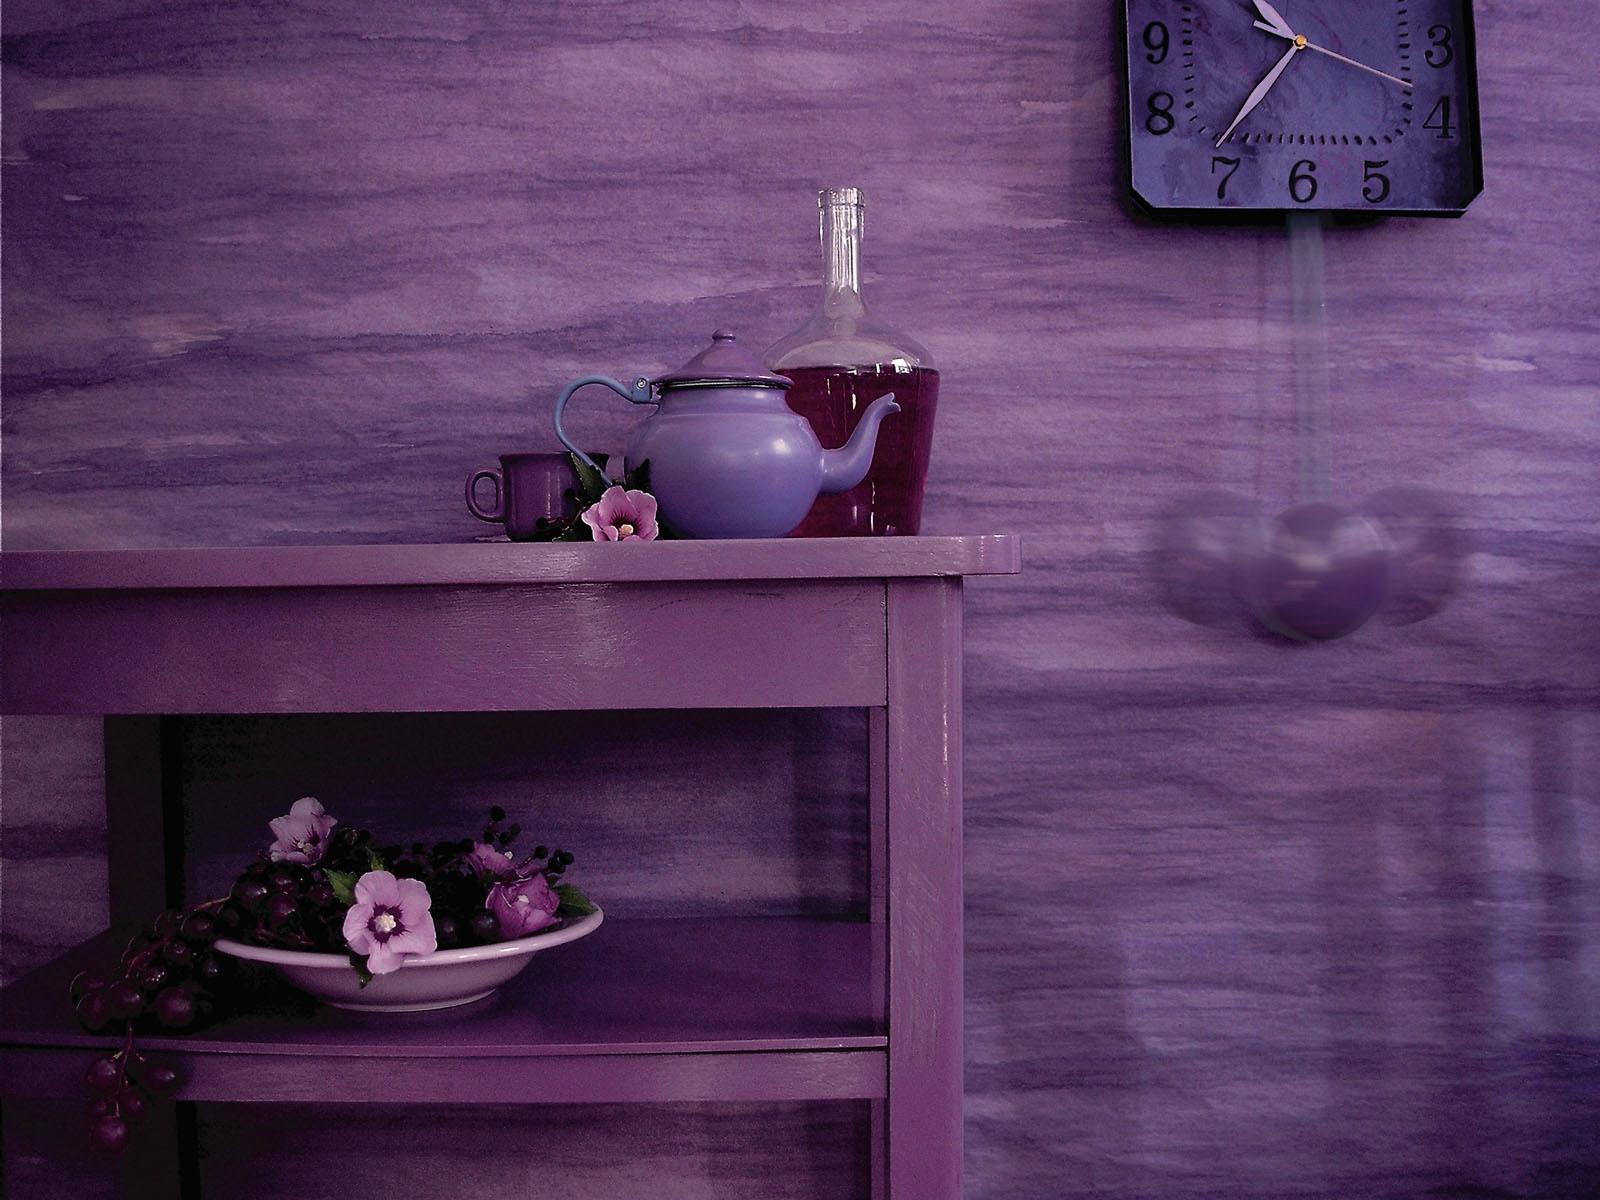 Purple Wallpaper Bedroom Wallpaper View Wallpaper In A Room